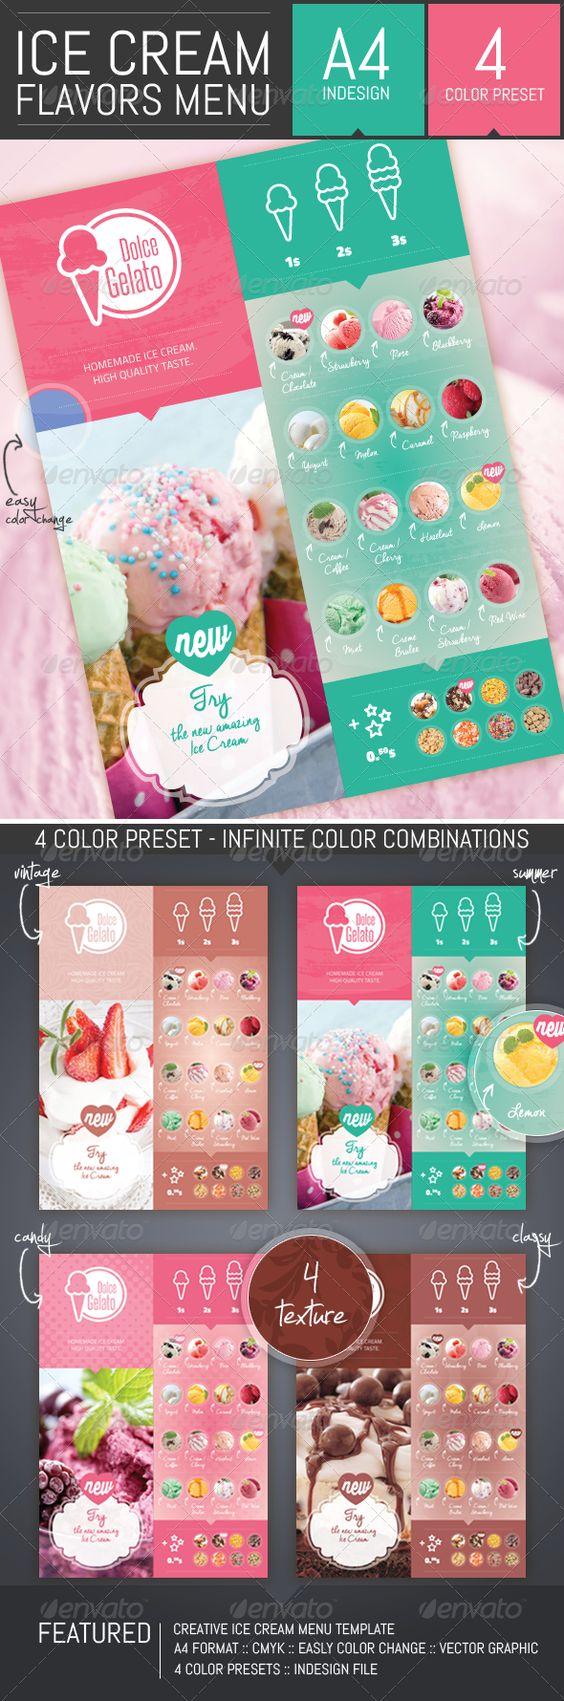 Ice Cream Flavor Menu Template #design Download: http://graphicriver.net/item/ice-cream-flavor-menu-template/8515743?ref=ksioks